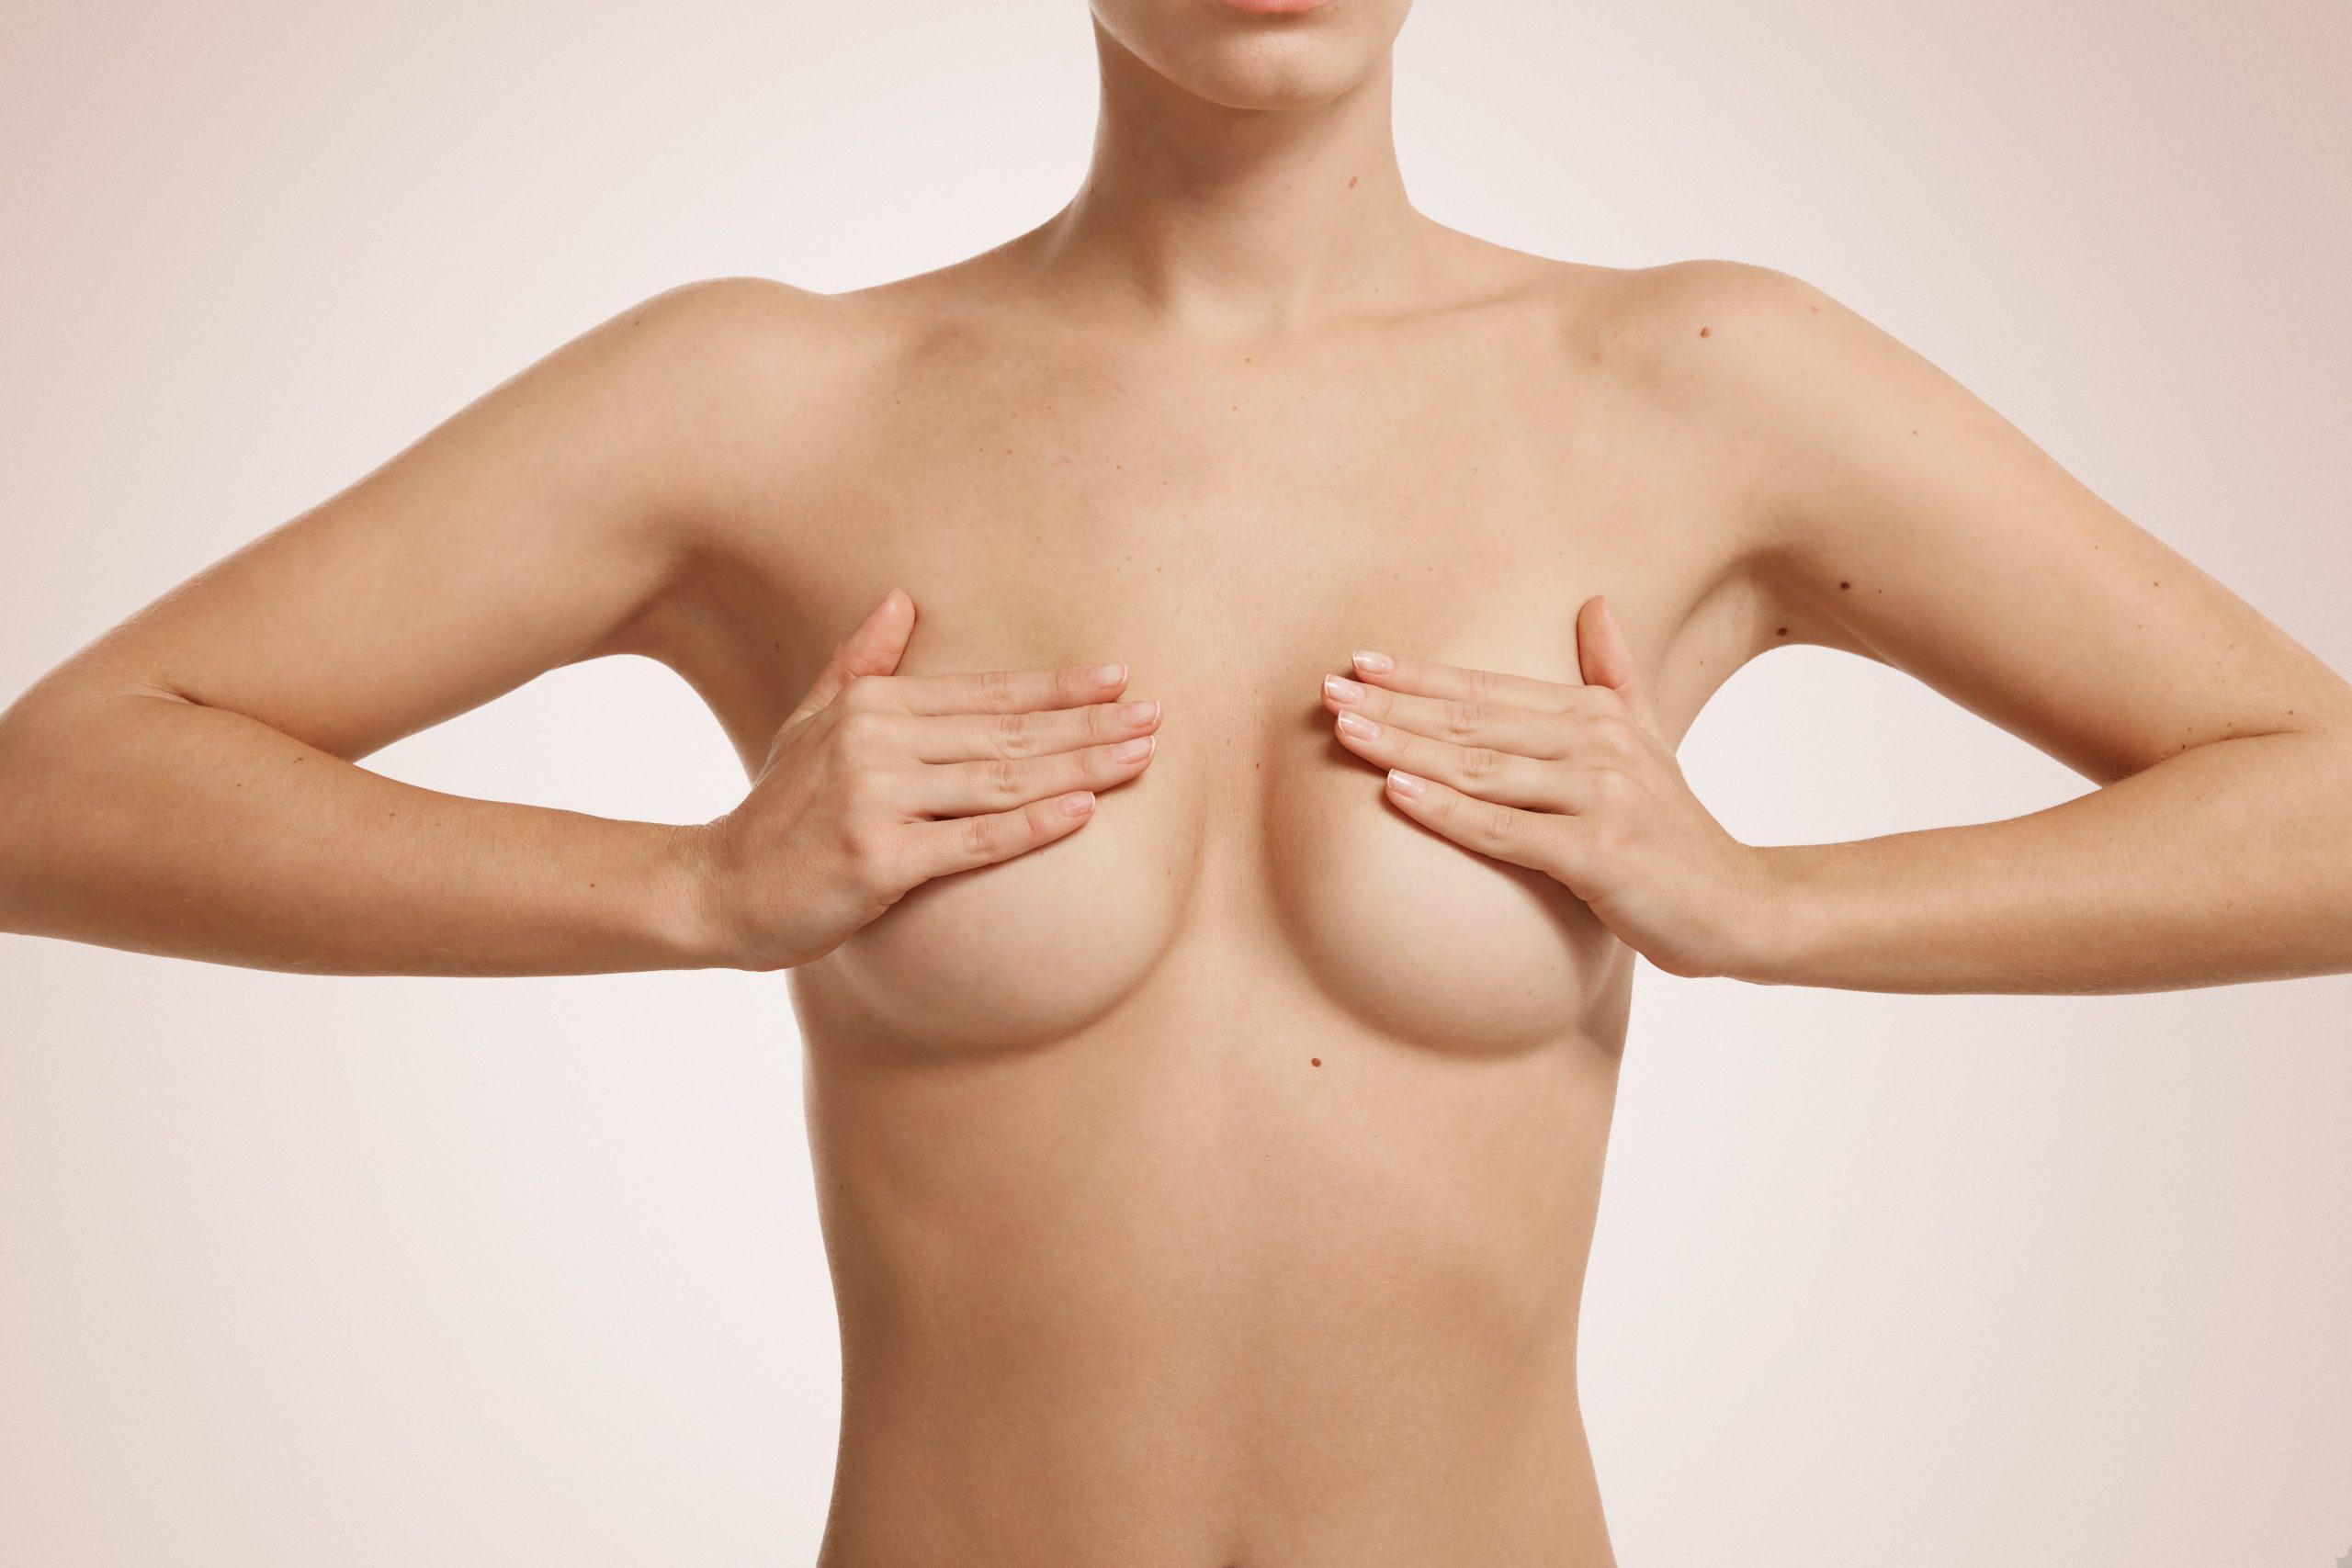 cada cuanto se cambian implantes de senos